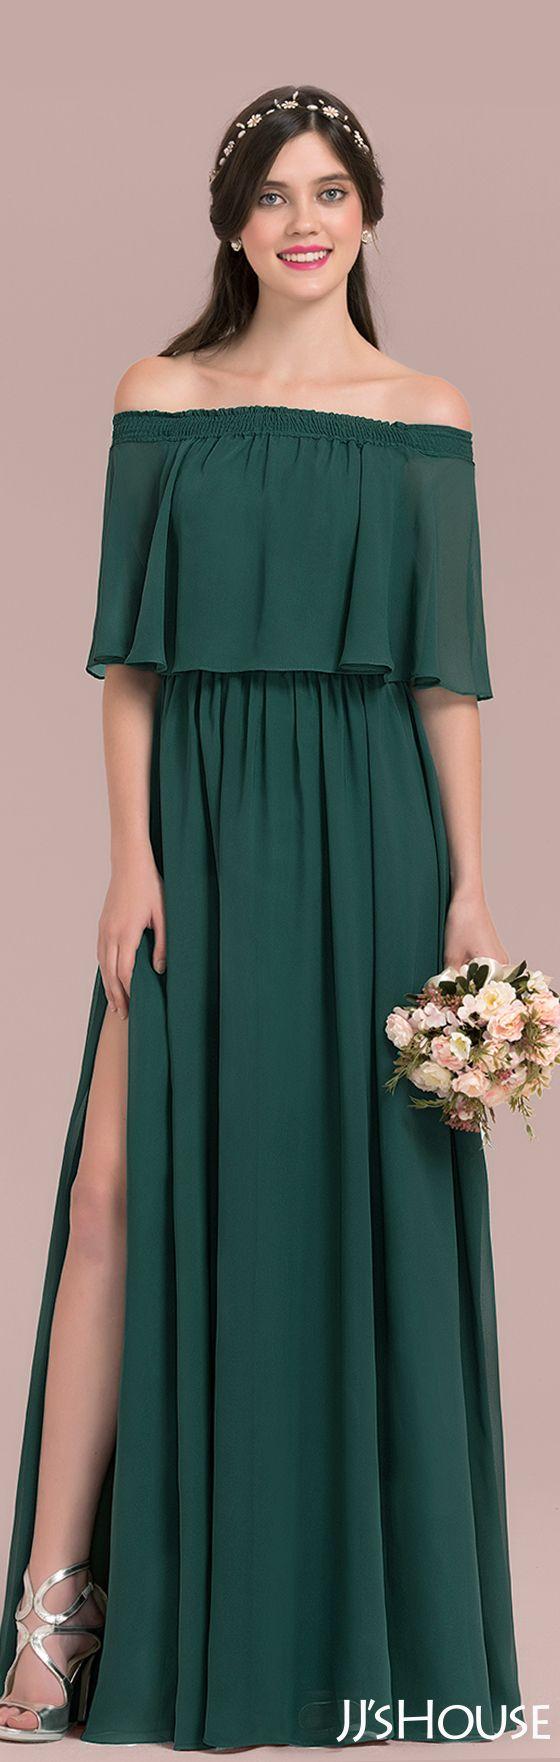 492 best jjshouse bridesmaid dresses images on pinterest such an amazing bridesmaid dress jjshouse bridesmaid ombrellifo Images